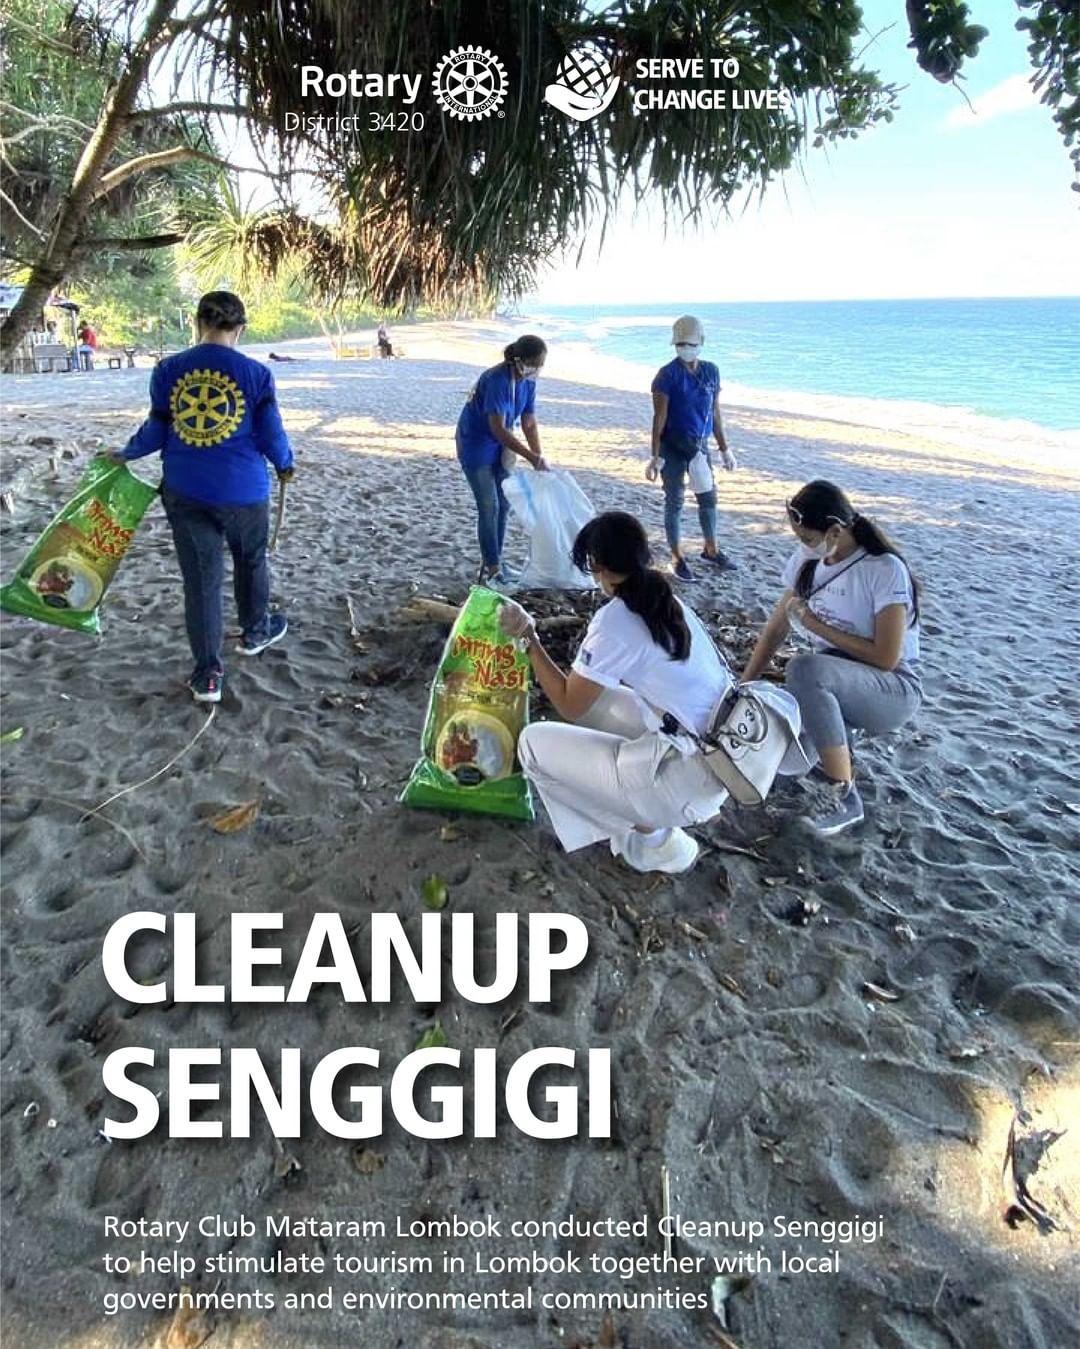 Cleanup Senggigi